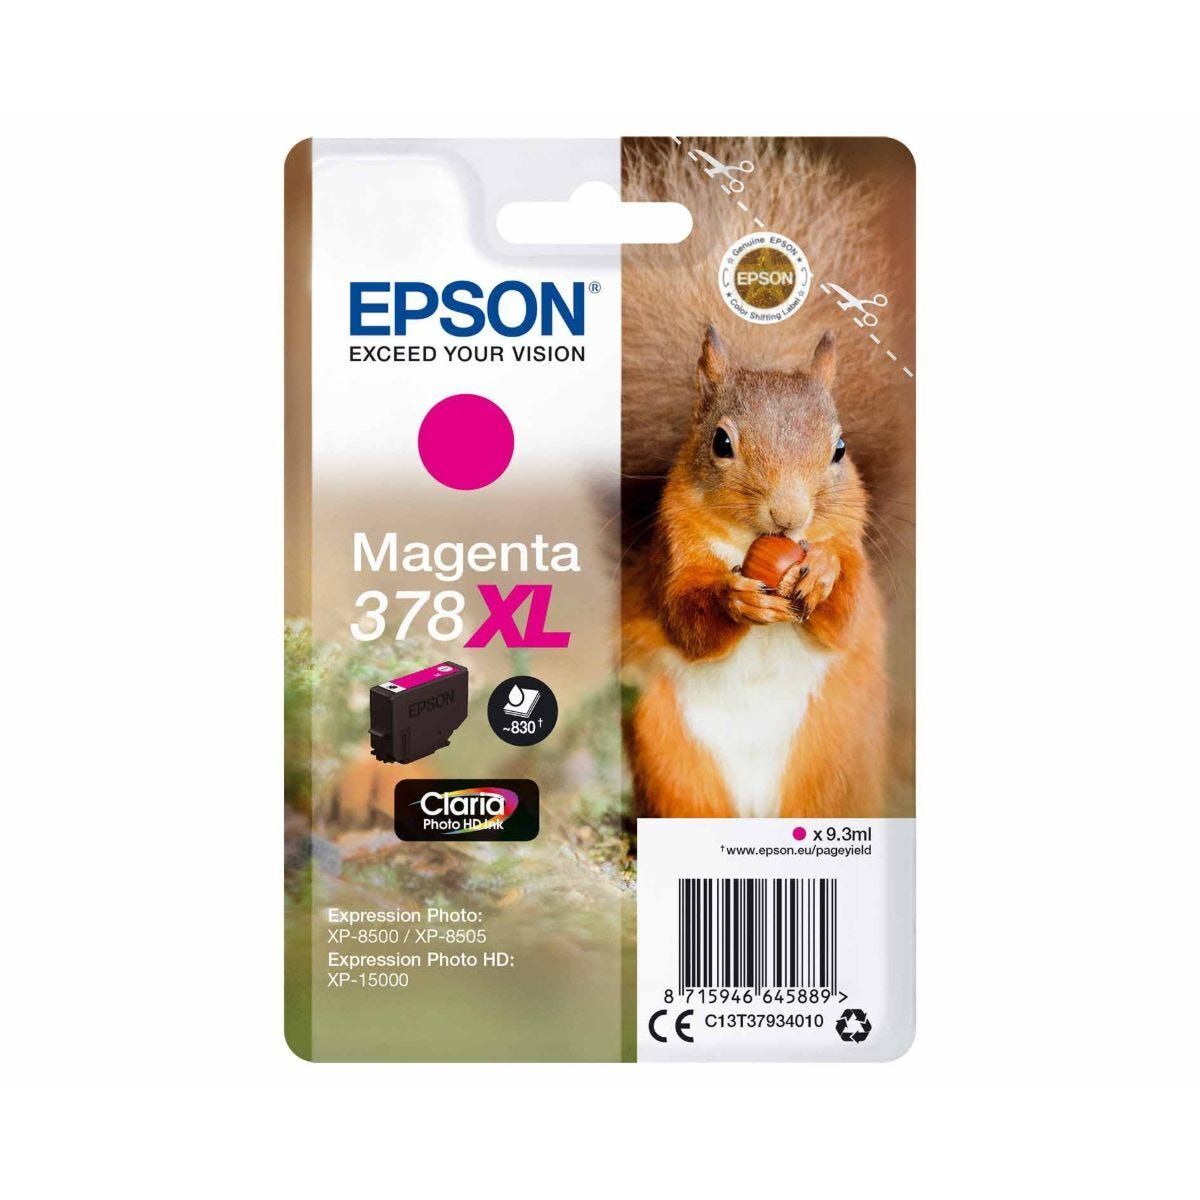 Epson 378XL Magenta Squirrel Original Ink Cartridge